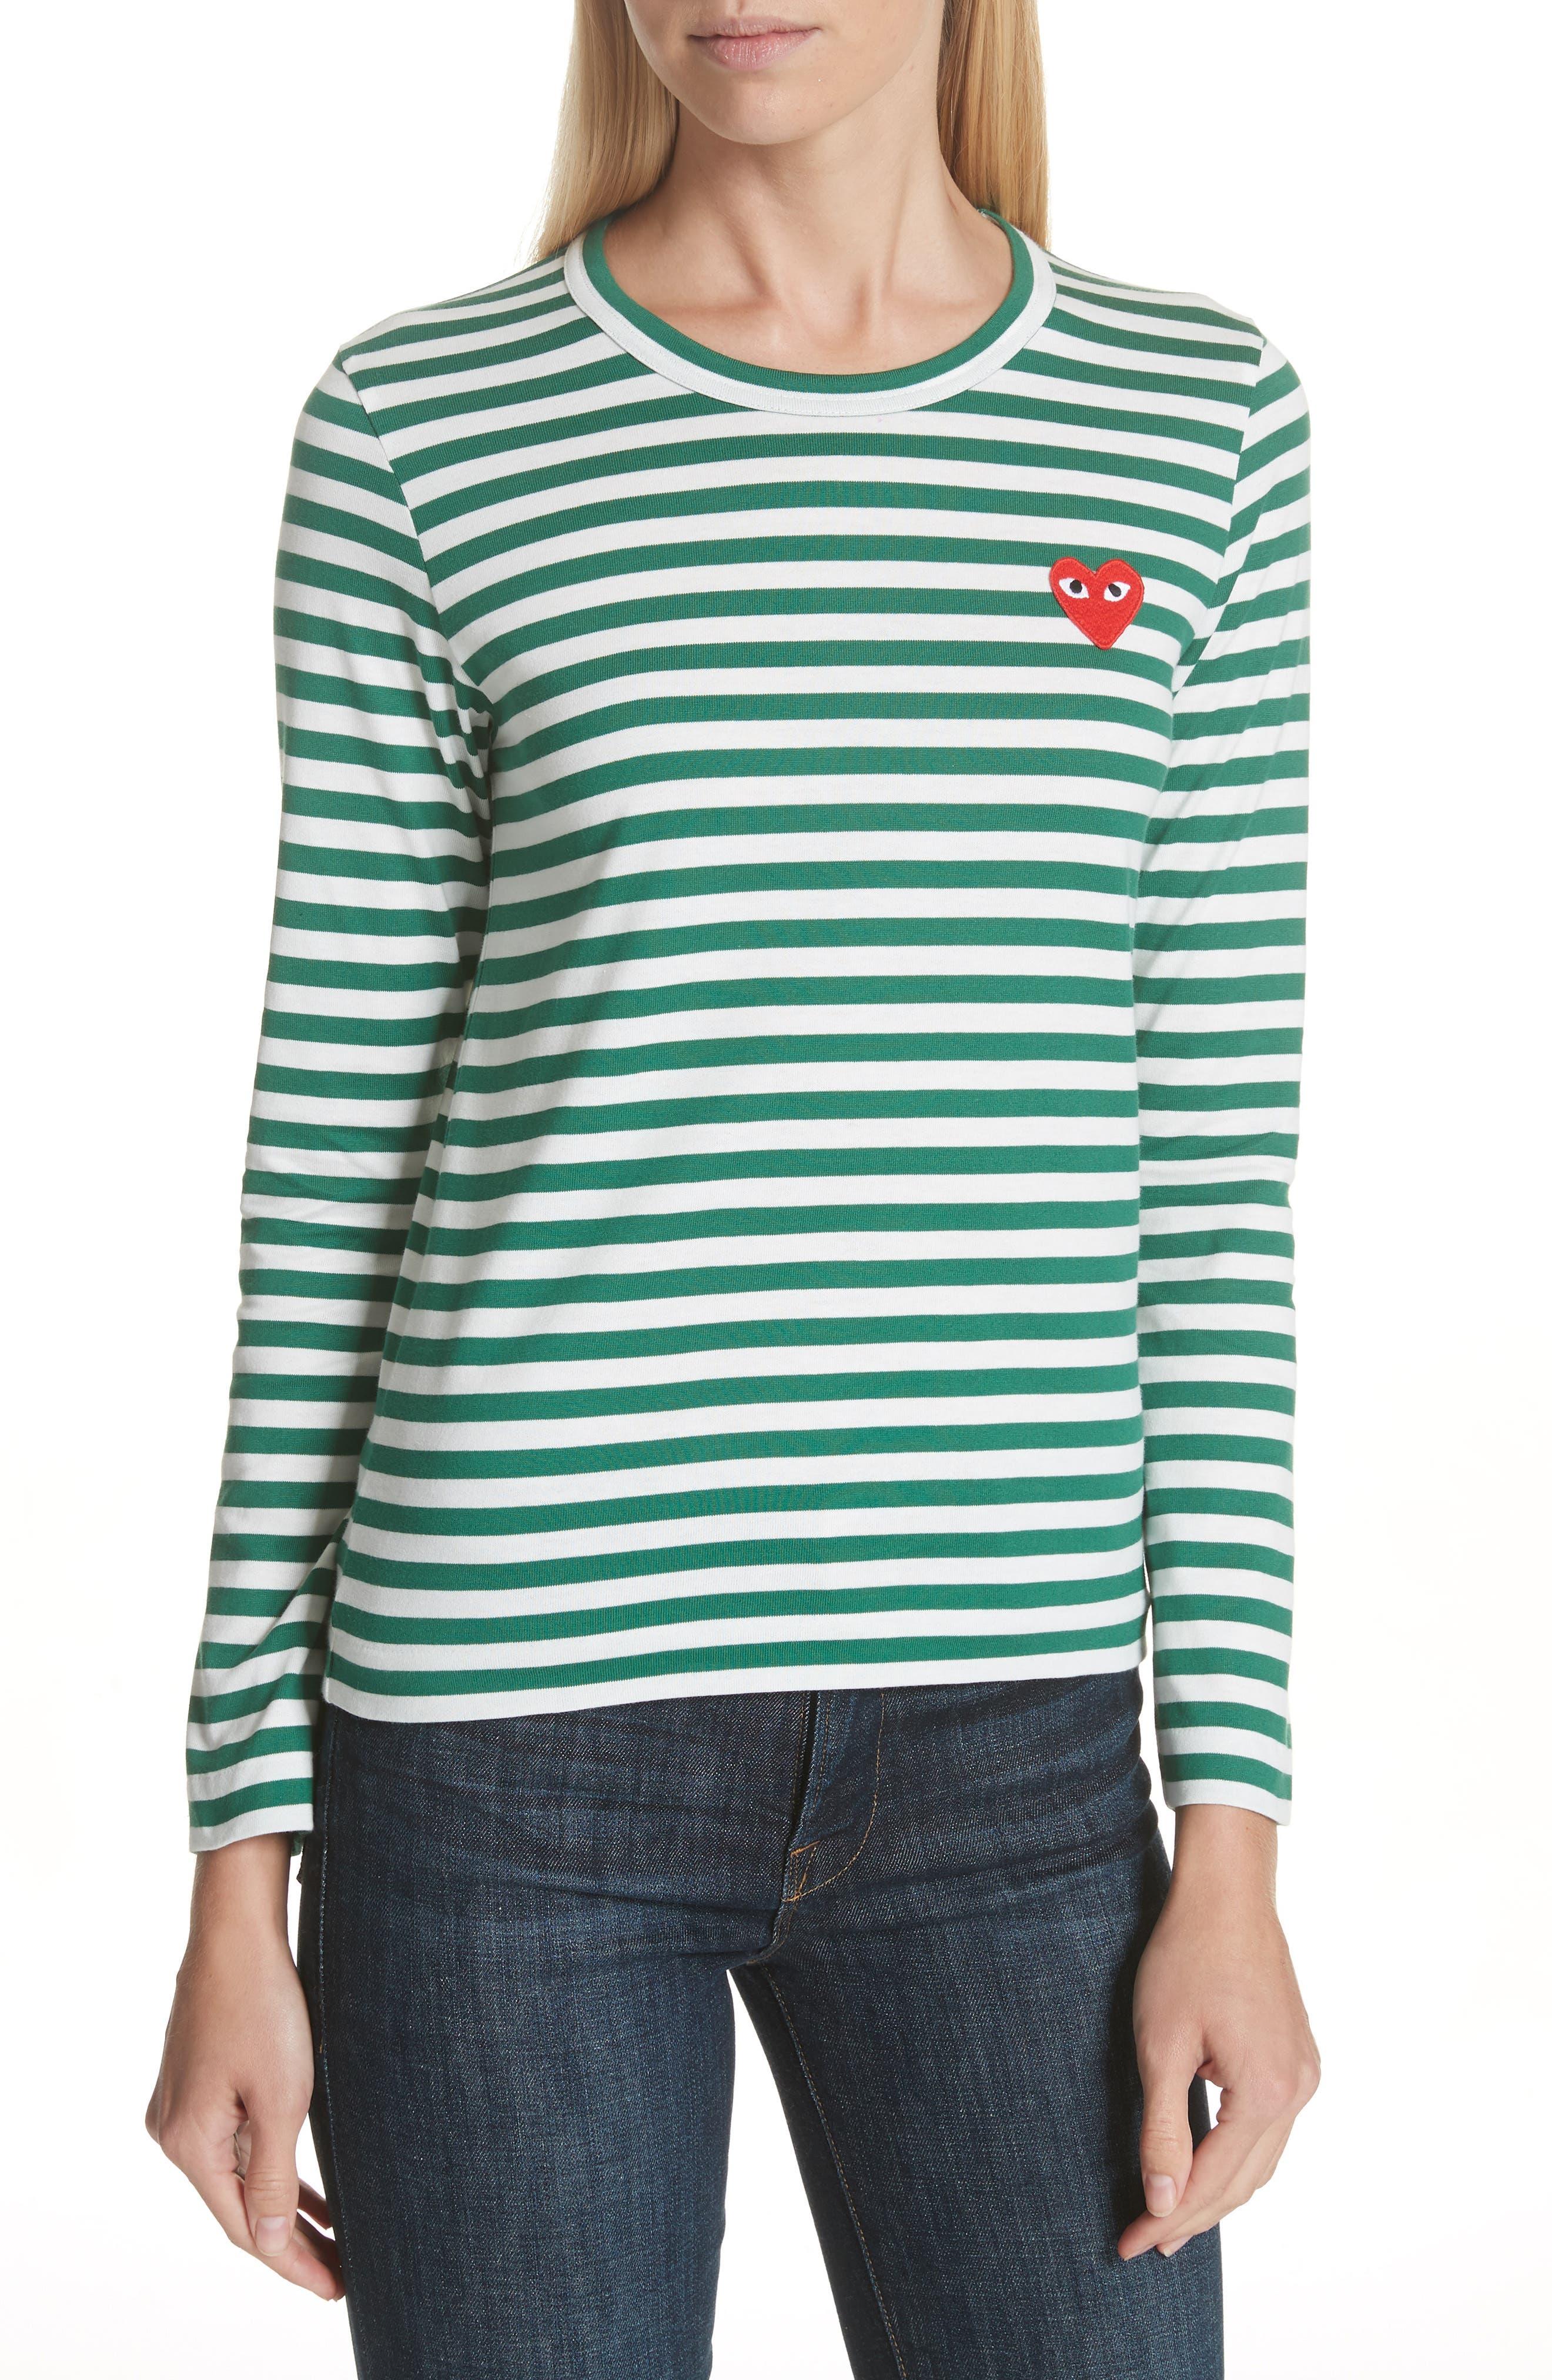 Comme des Garçons PLAY Stripe Cotton Tee,                         Main,                         color, GREEN/ WHITE